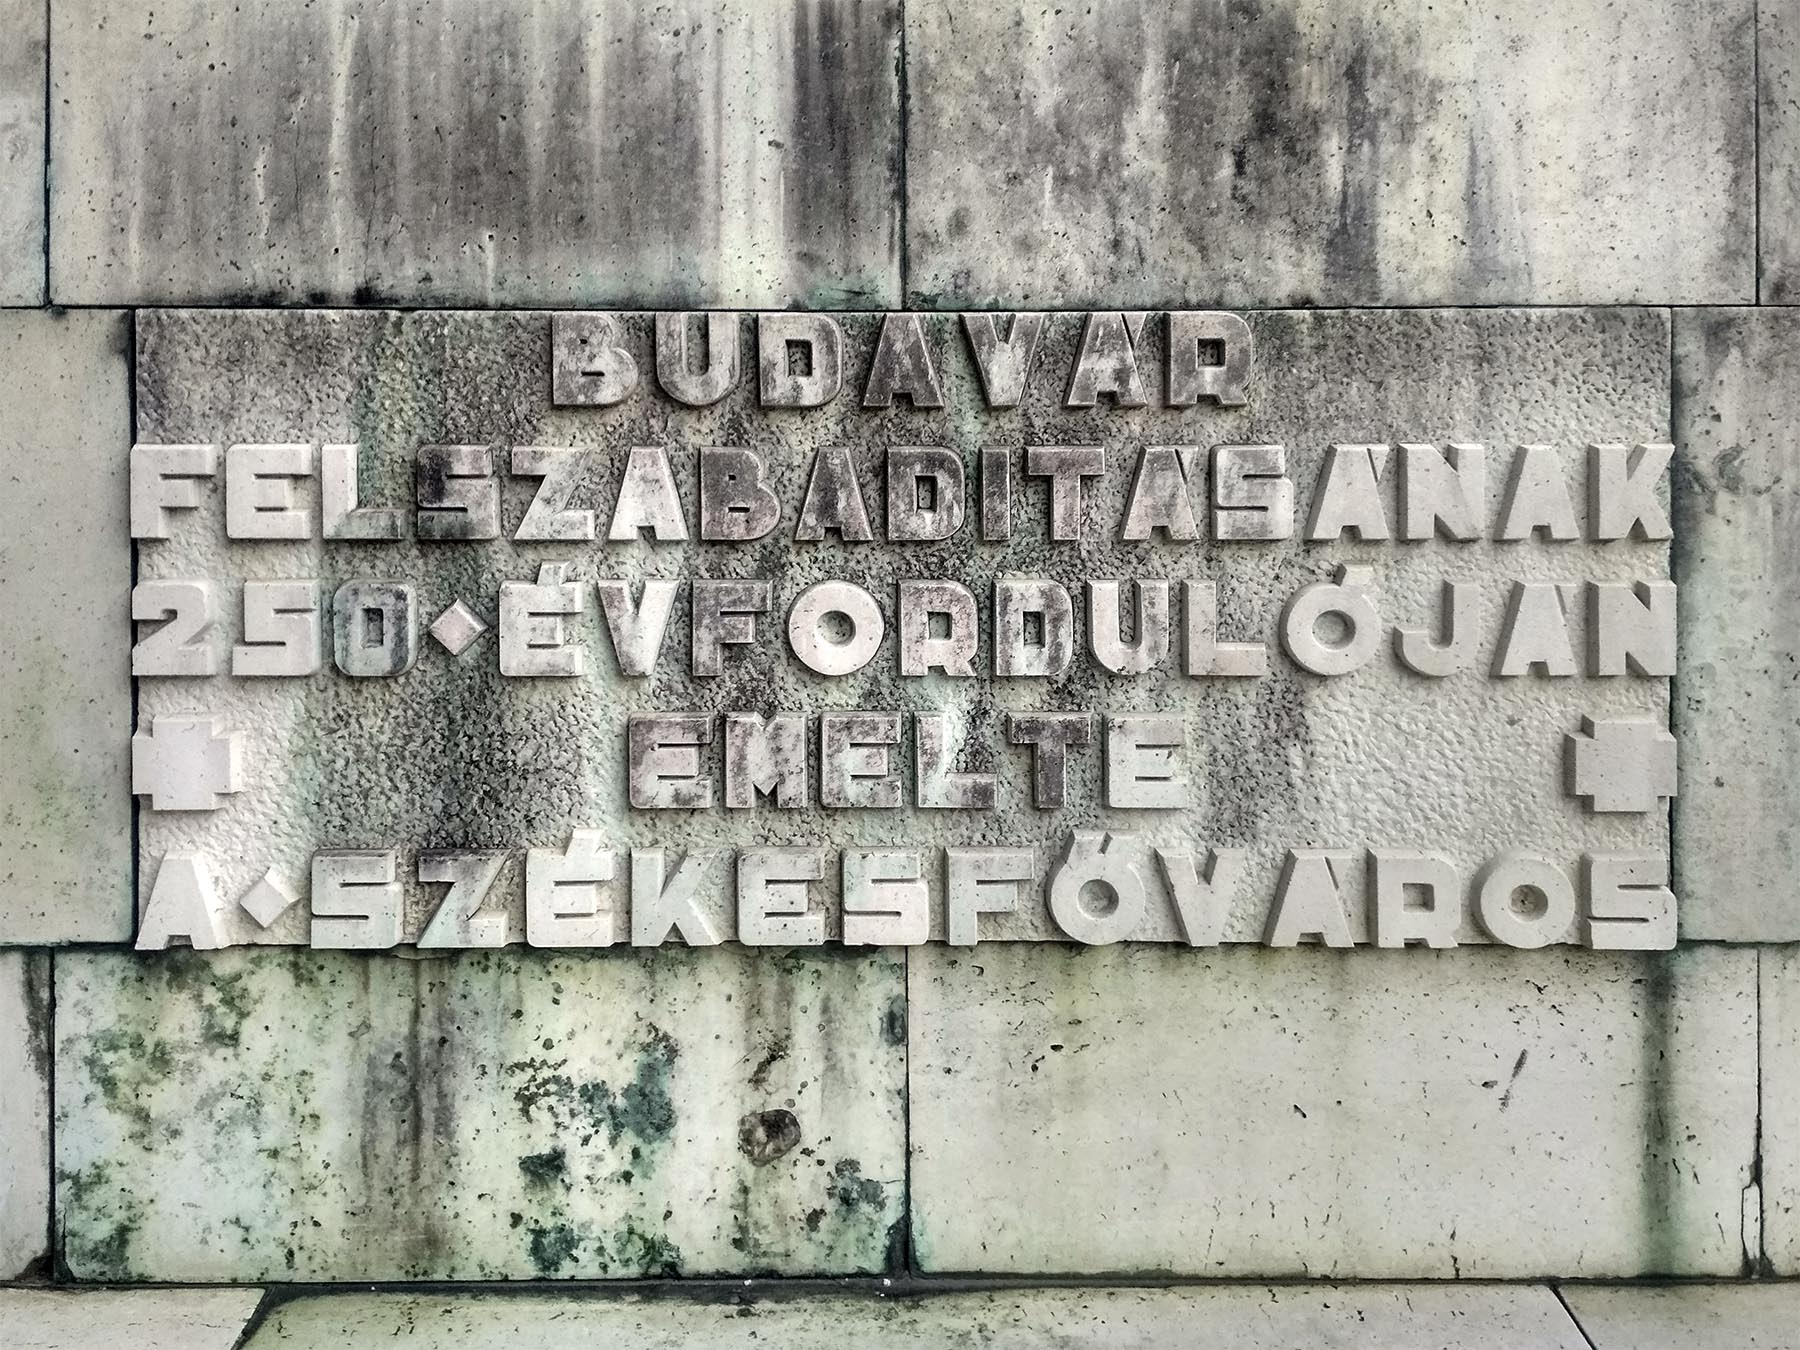 Hungary 21 Stavros G @stavros_edge lo